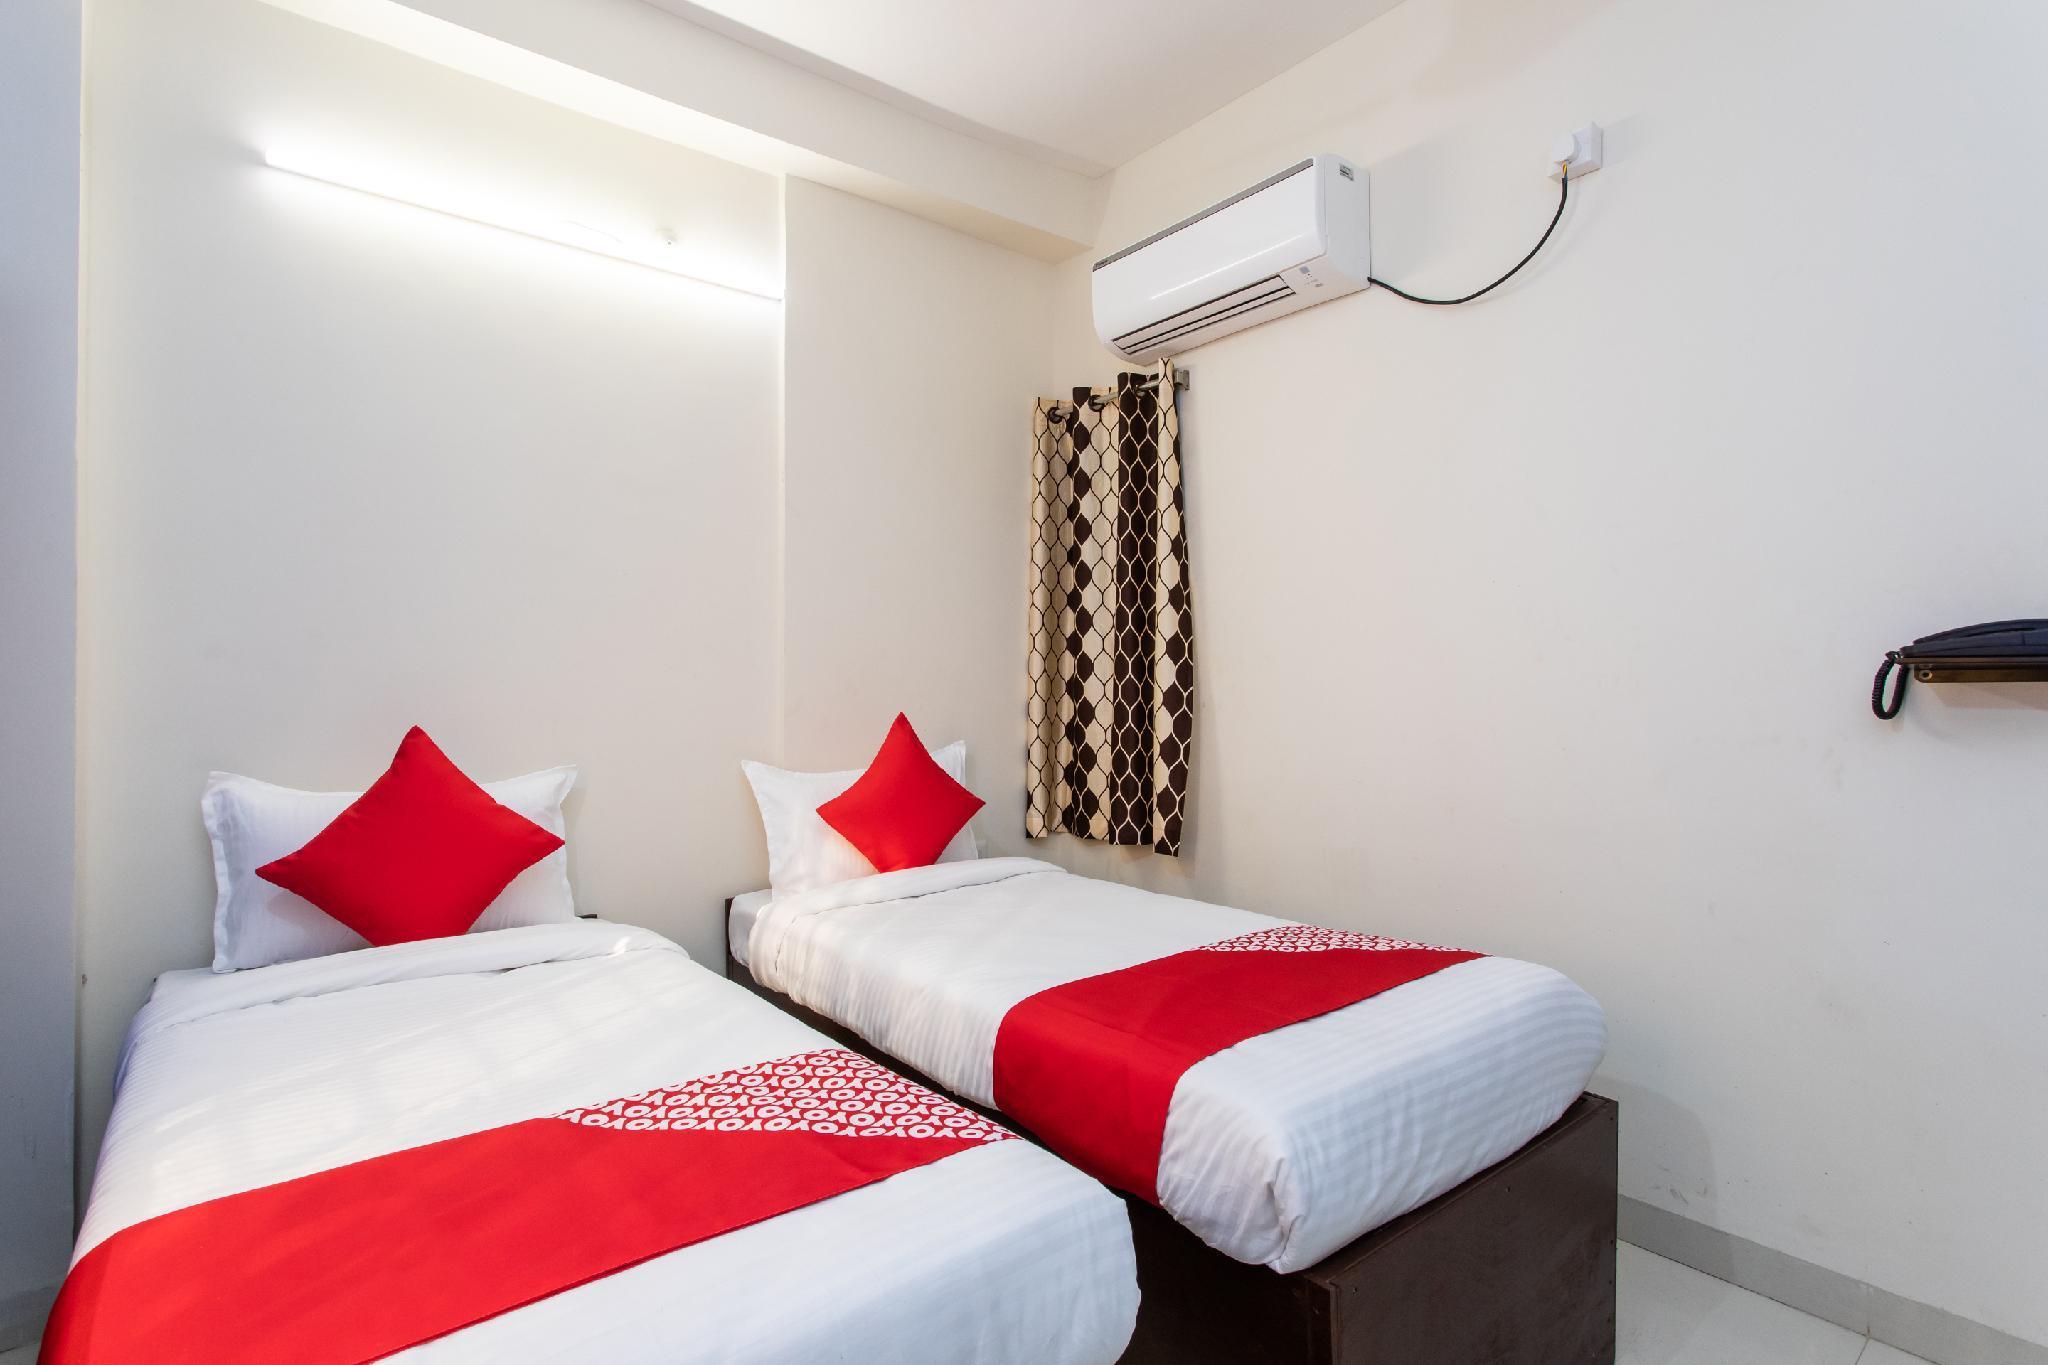 OYO 27862 Shree Devina Palace, Indore